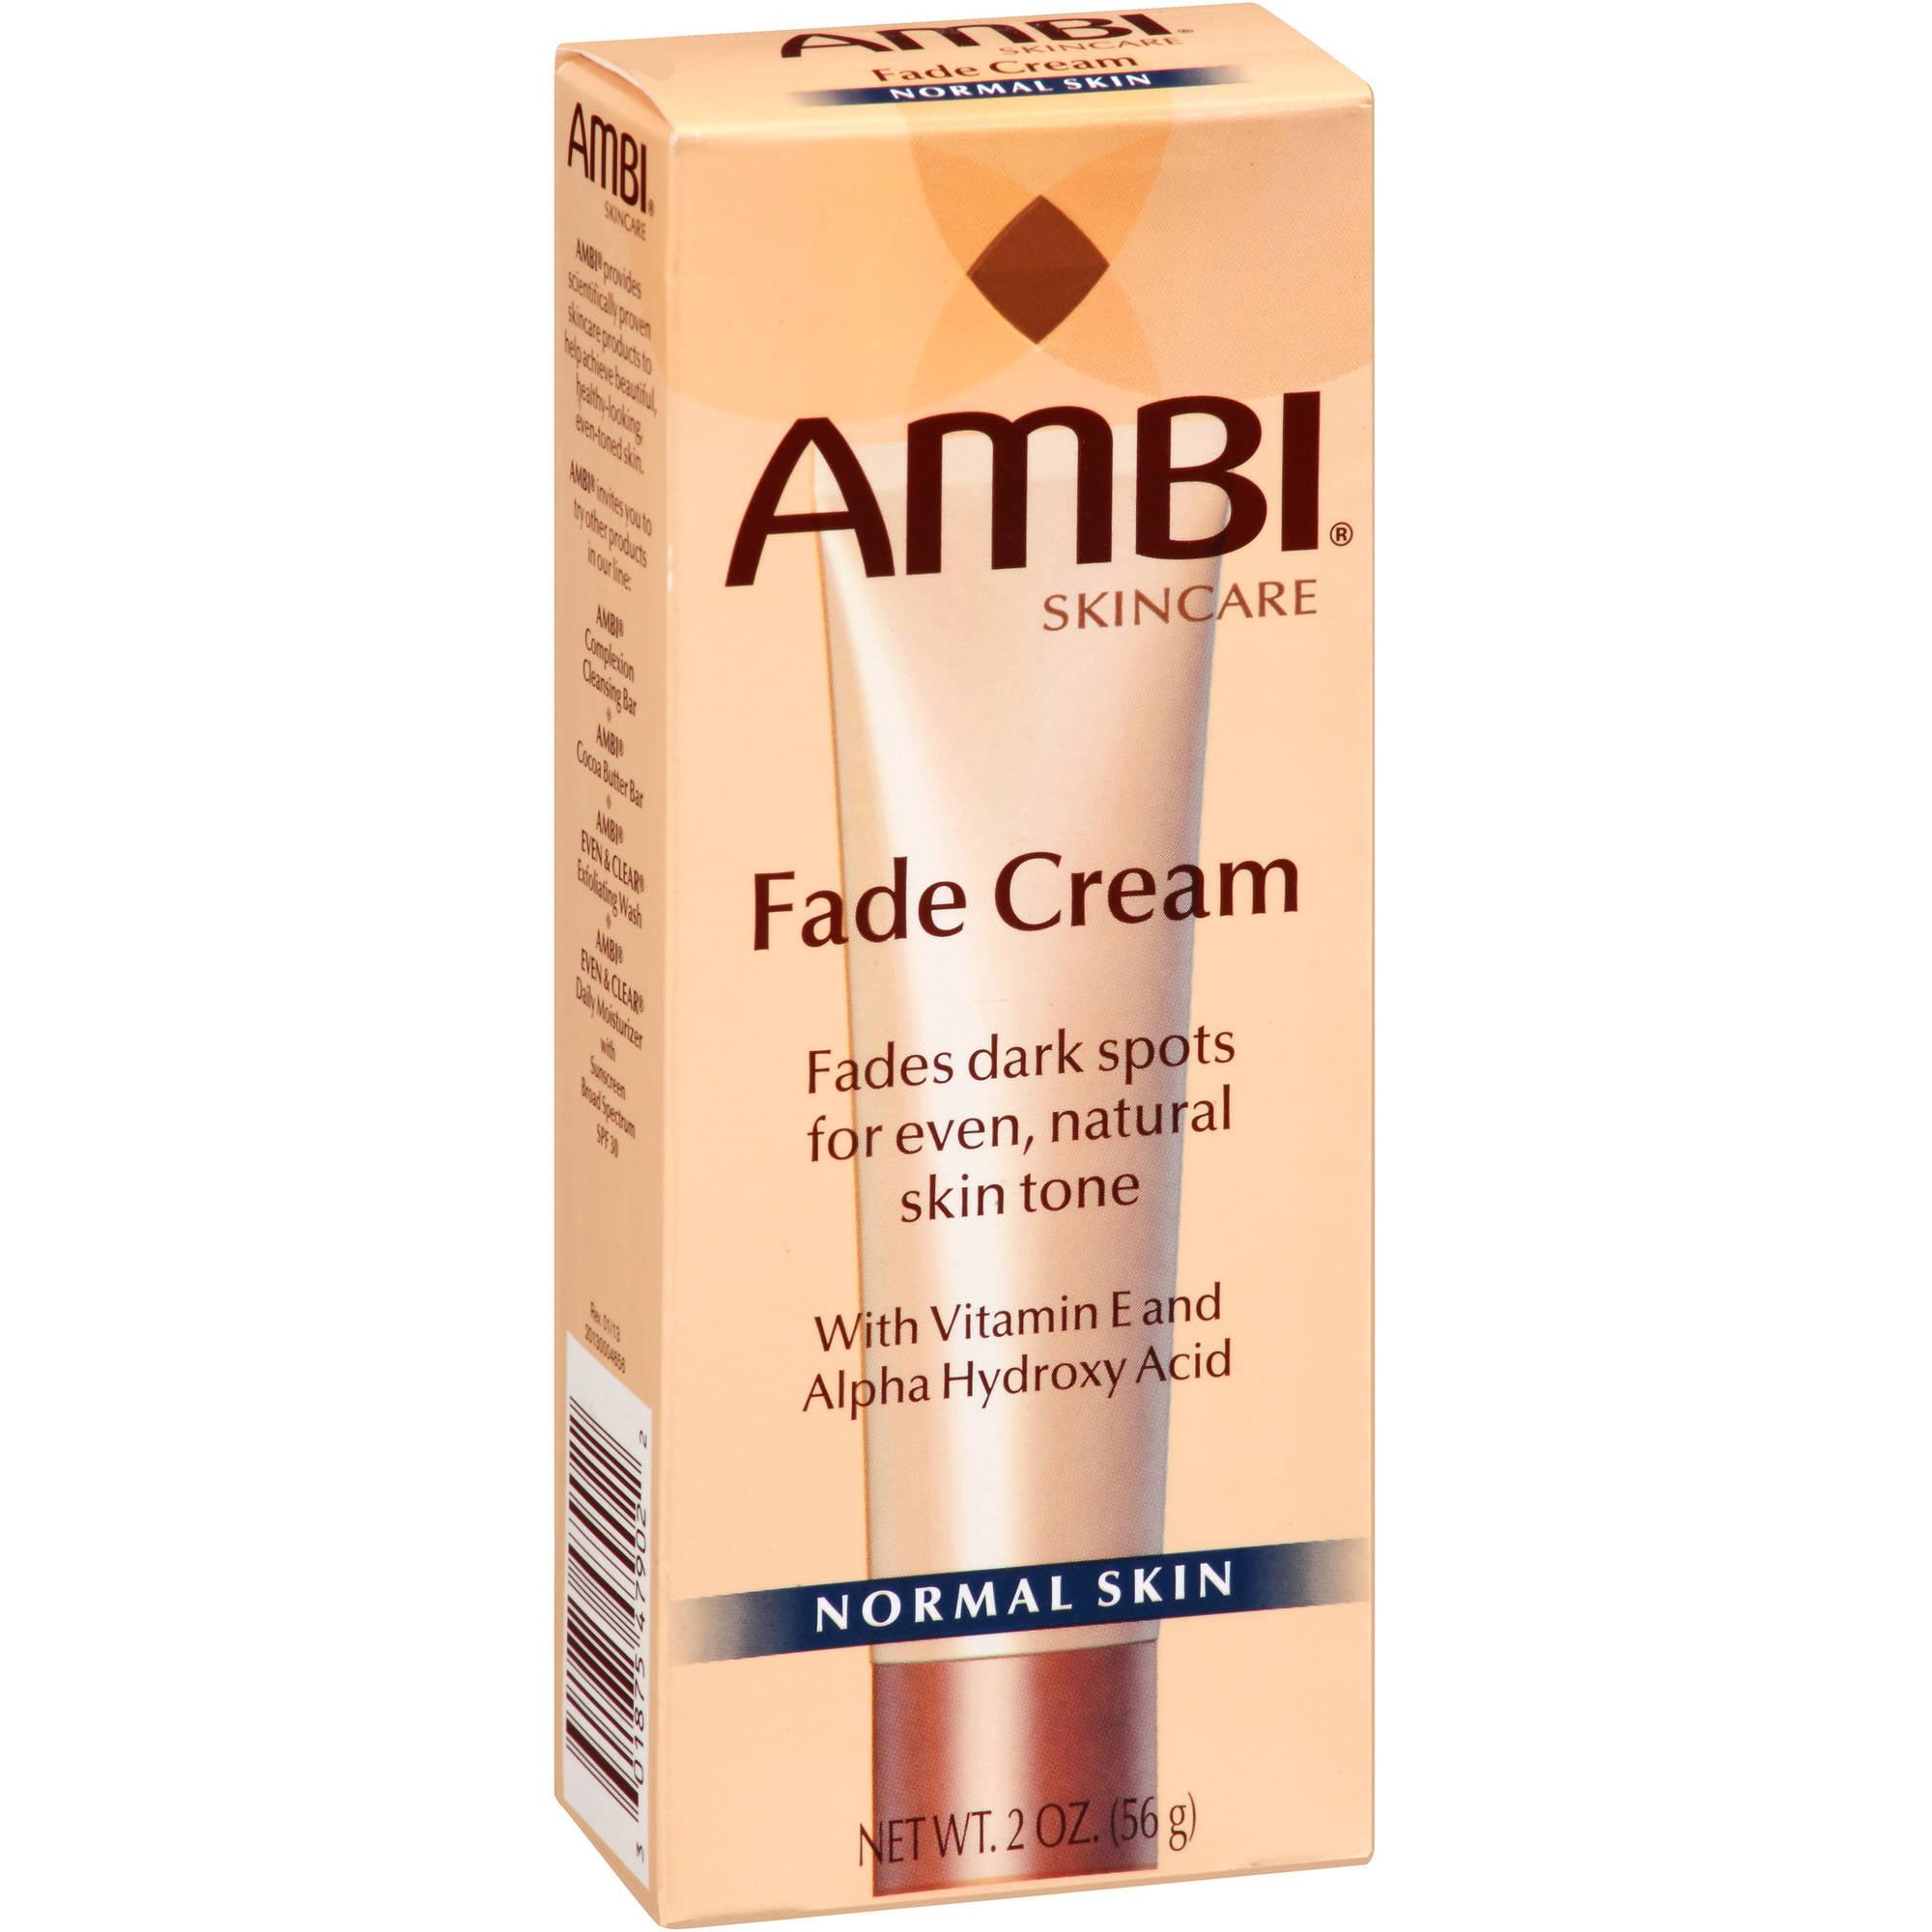 AMBI Normal Skin Fade Cream, 2 oz